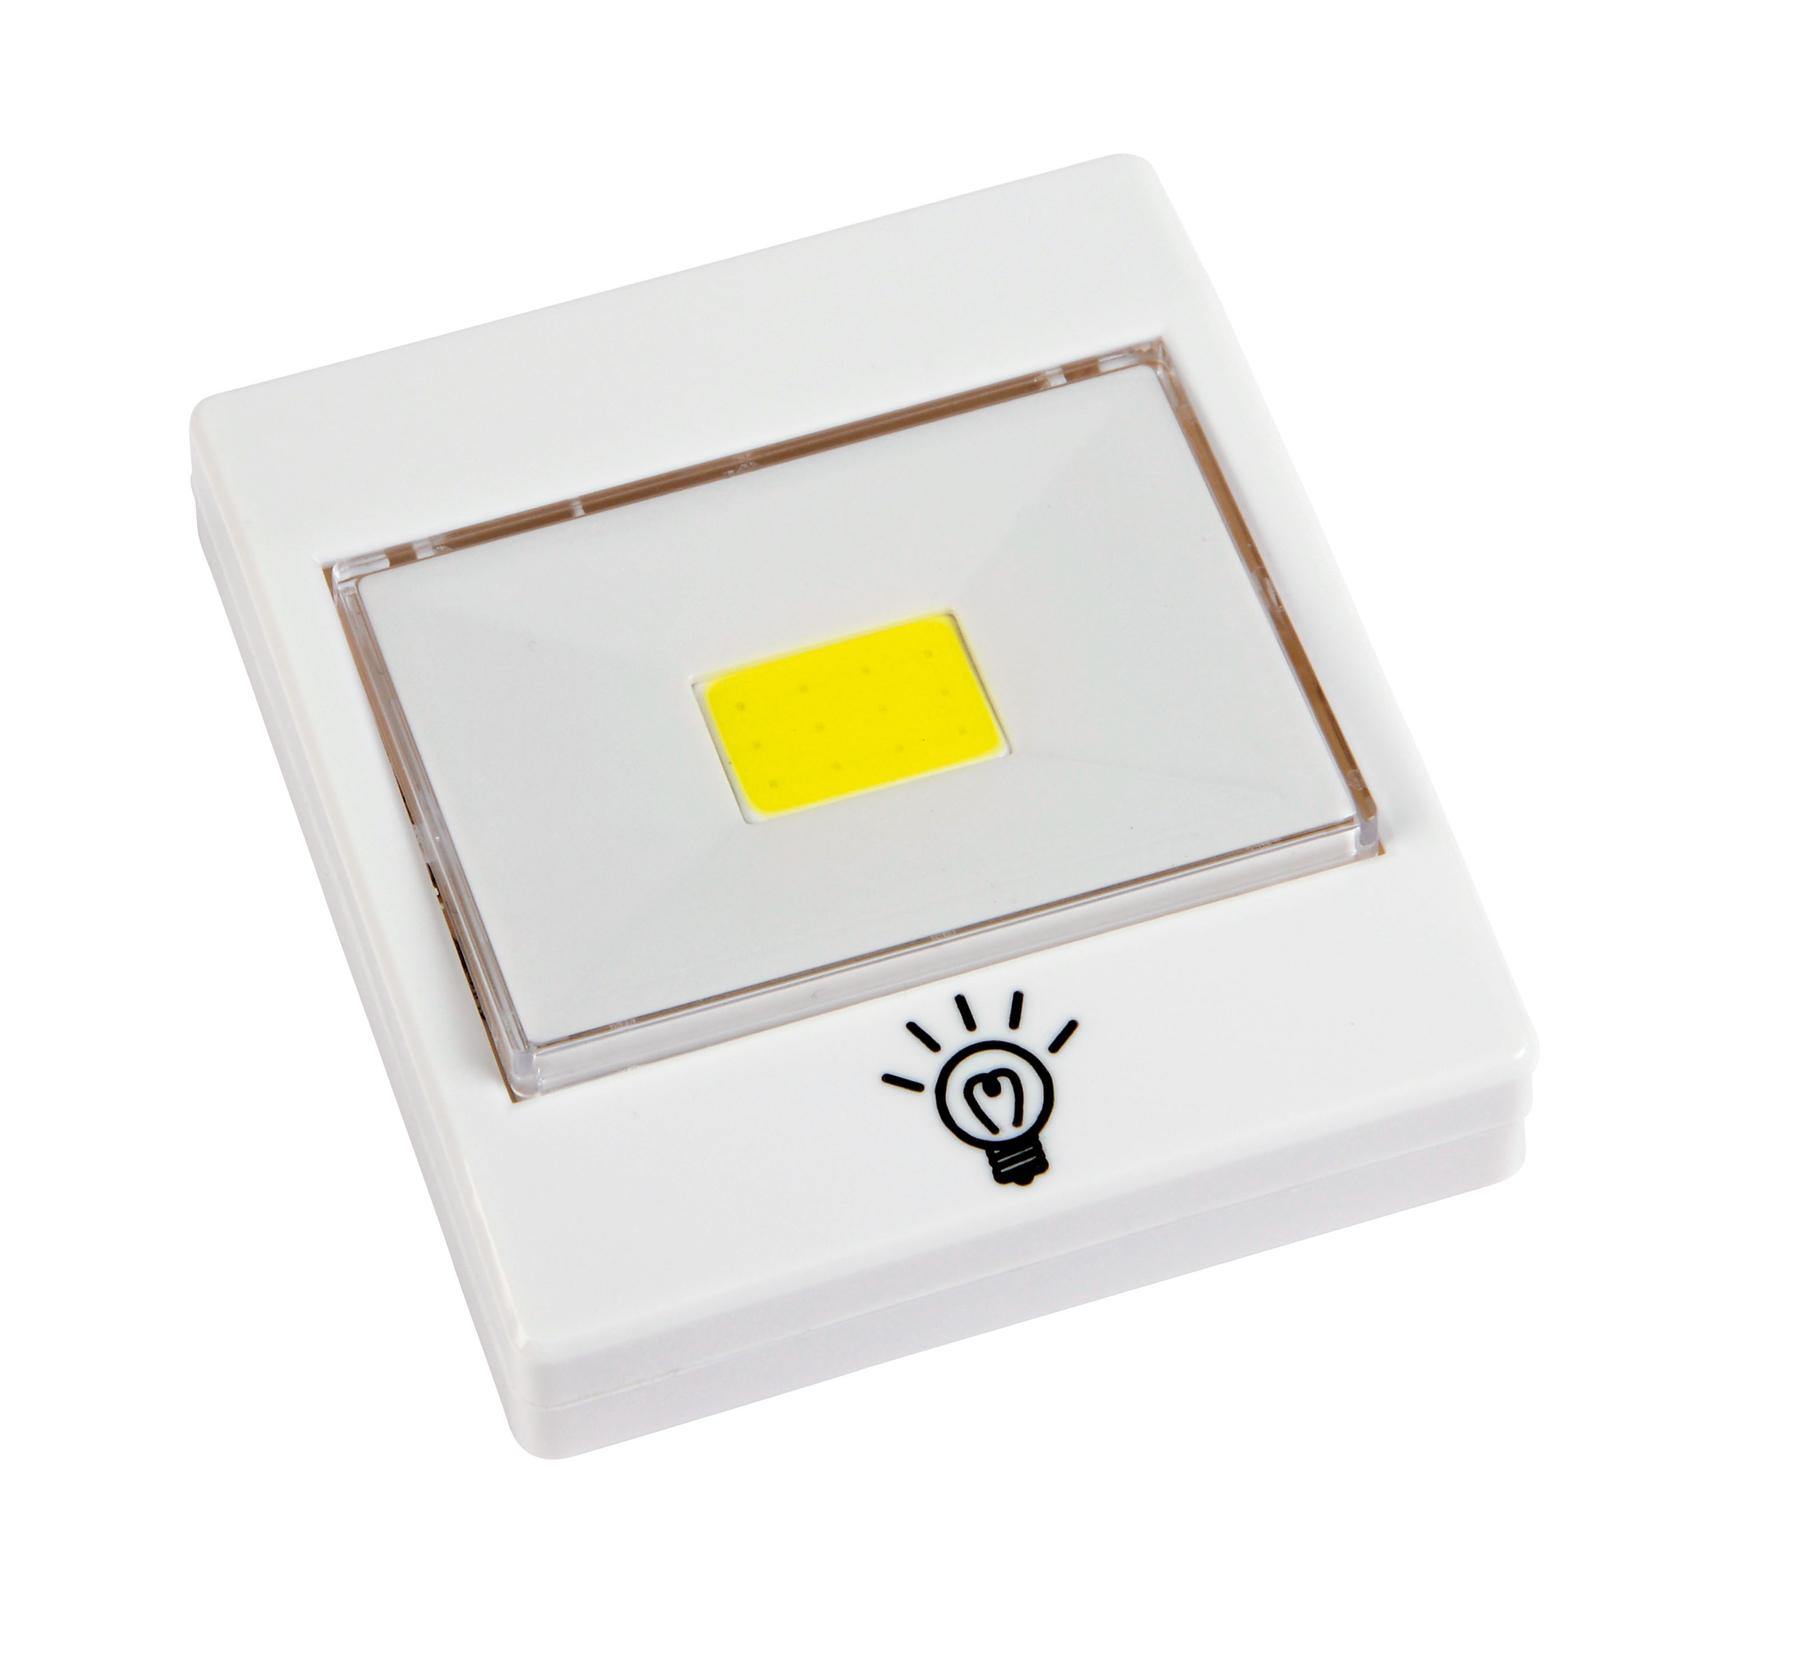 Lampka LED SWITCH IT, biały